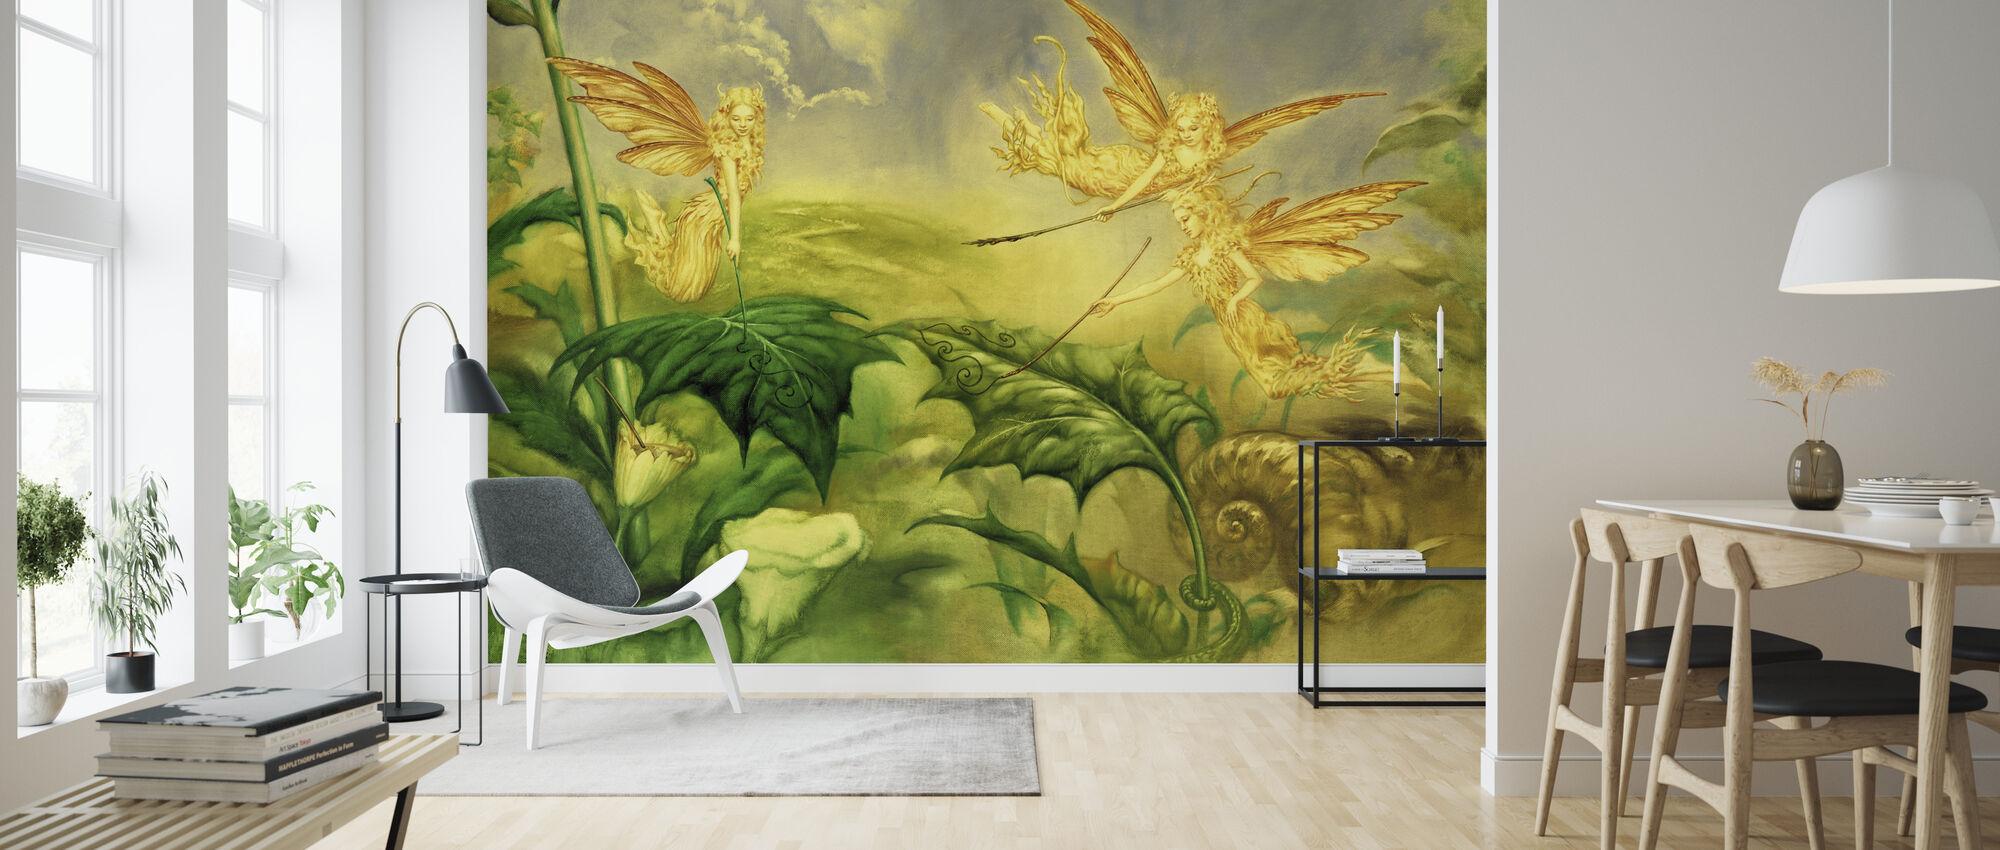 Fairies - Wallpaper - Living Room